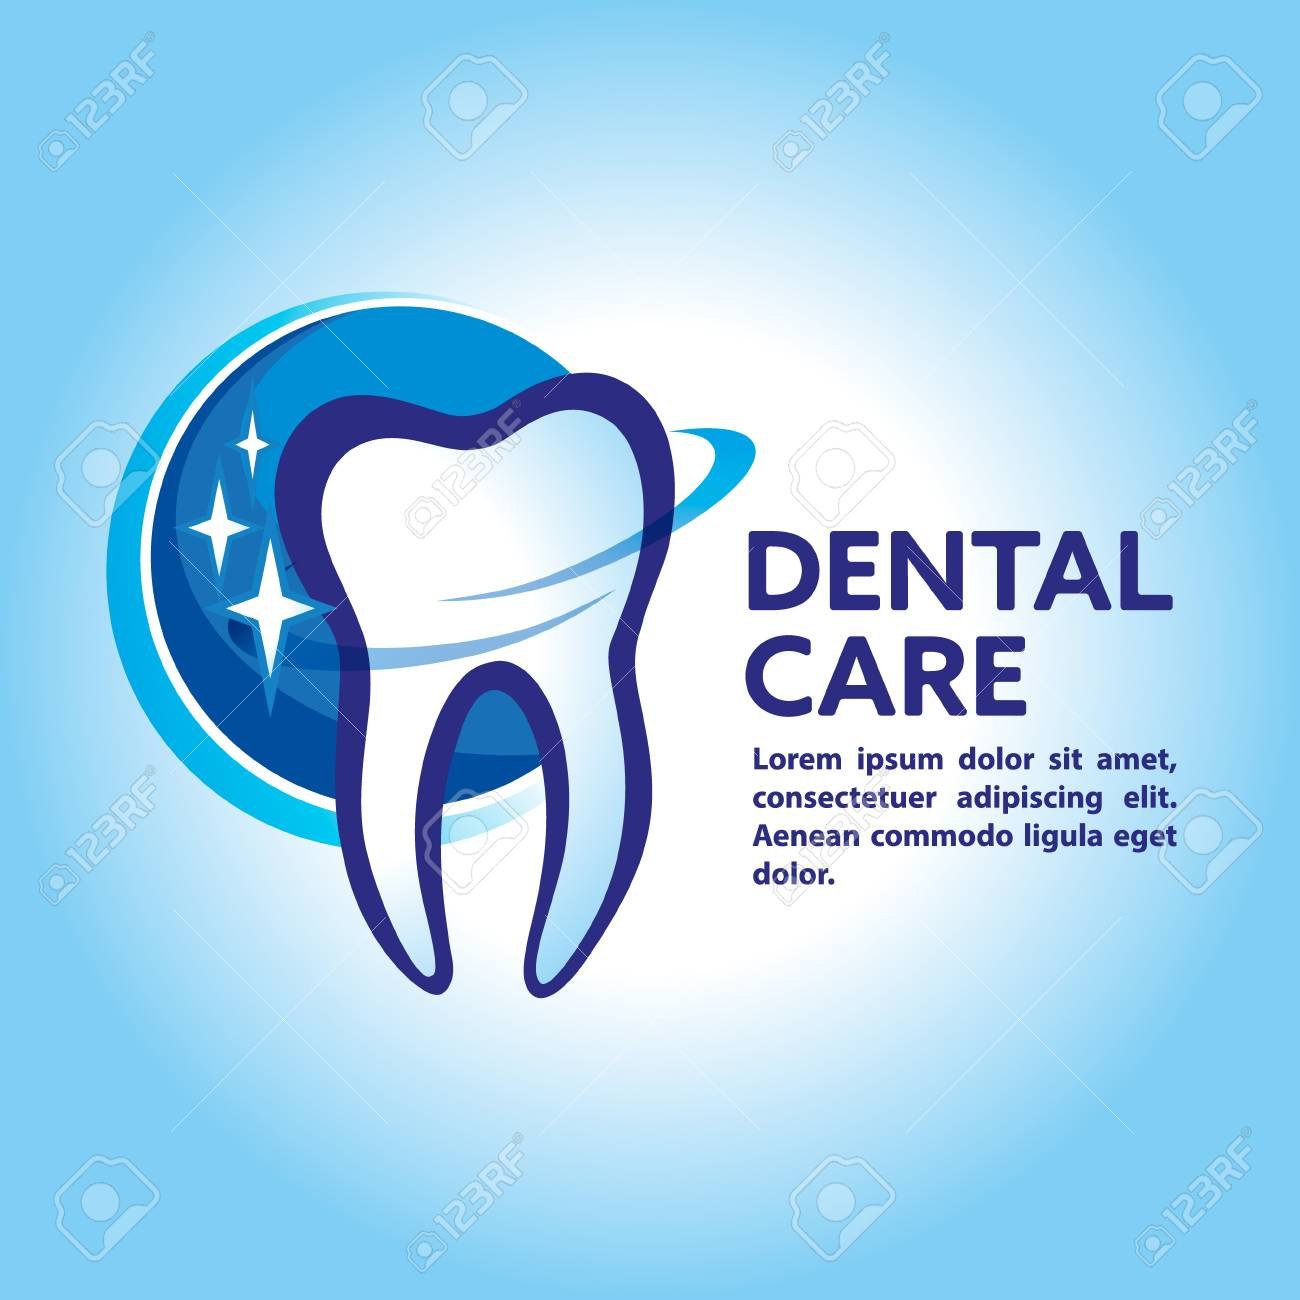 Health Dent Logo Design Vector Cosmetic Dental Dentistry Clinic Logotype Concept Icon